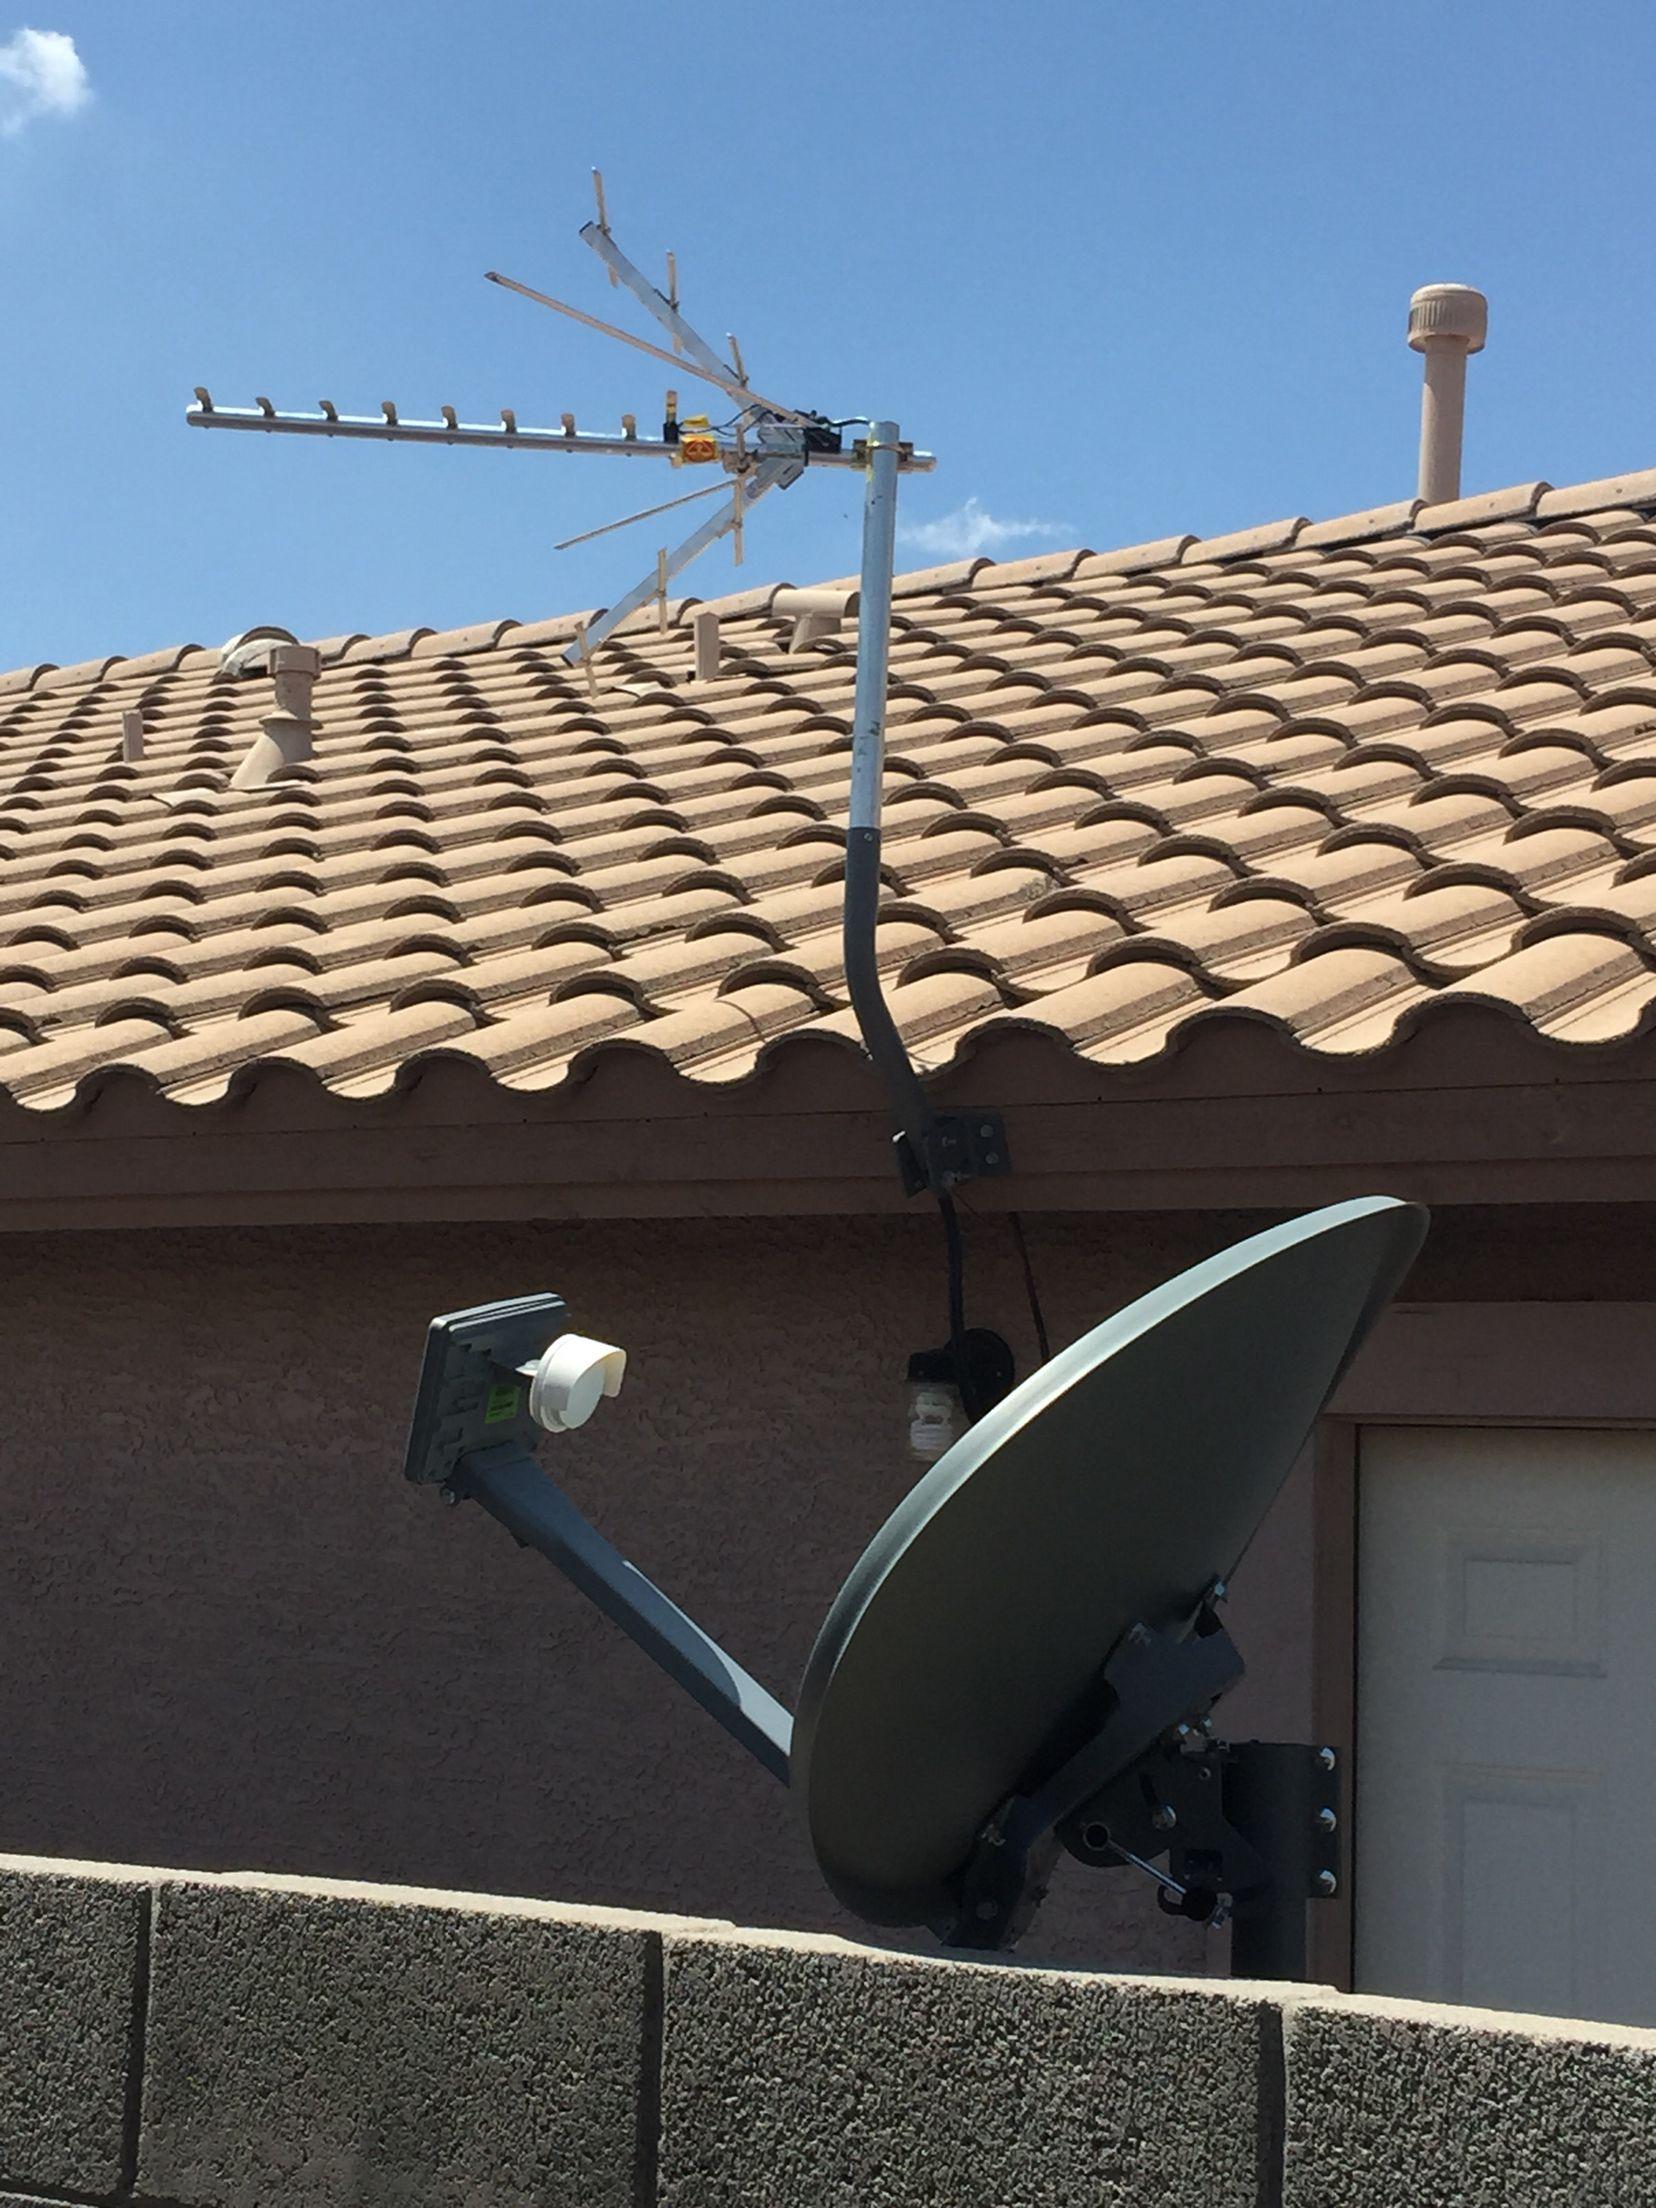 Free Hdtv Vs Paid Satellite Tv One Time Fee For Free Hdtv Www Freehdtvaz Com Satellite Dish Satellite Tv Hdtv Antenna